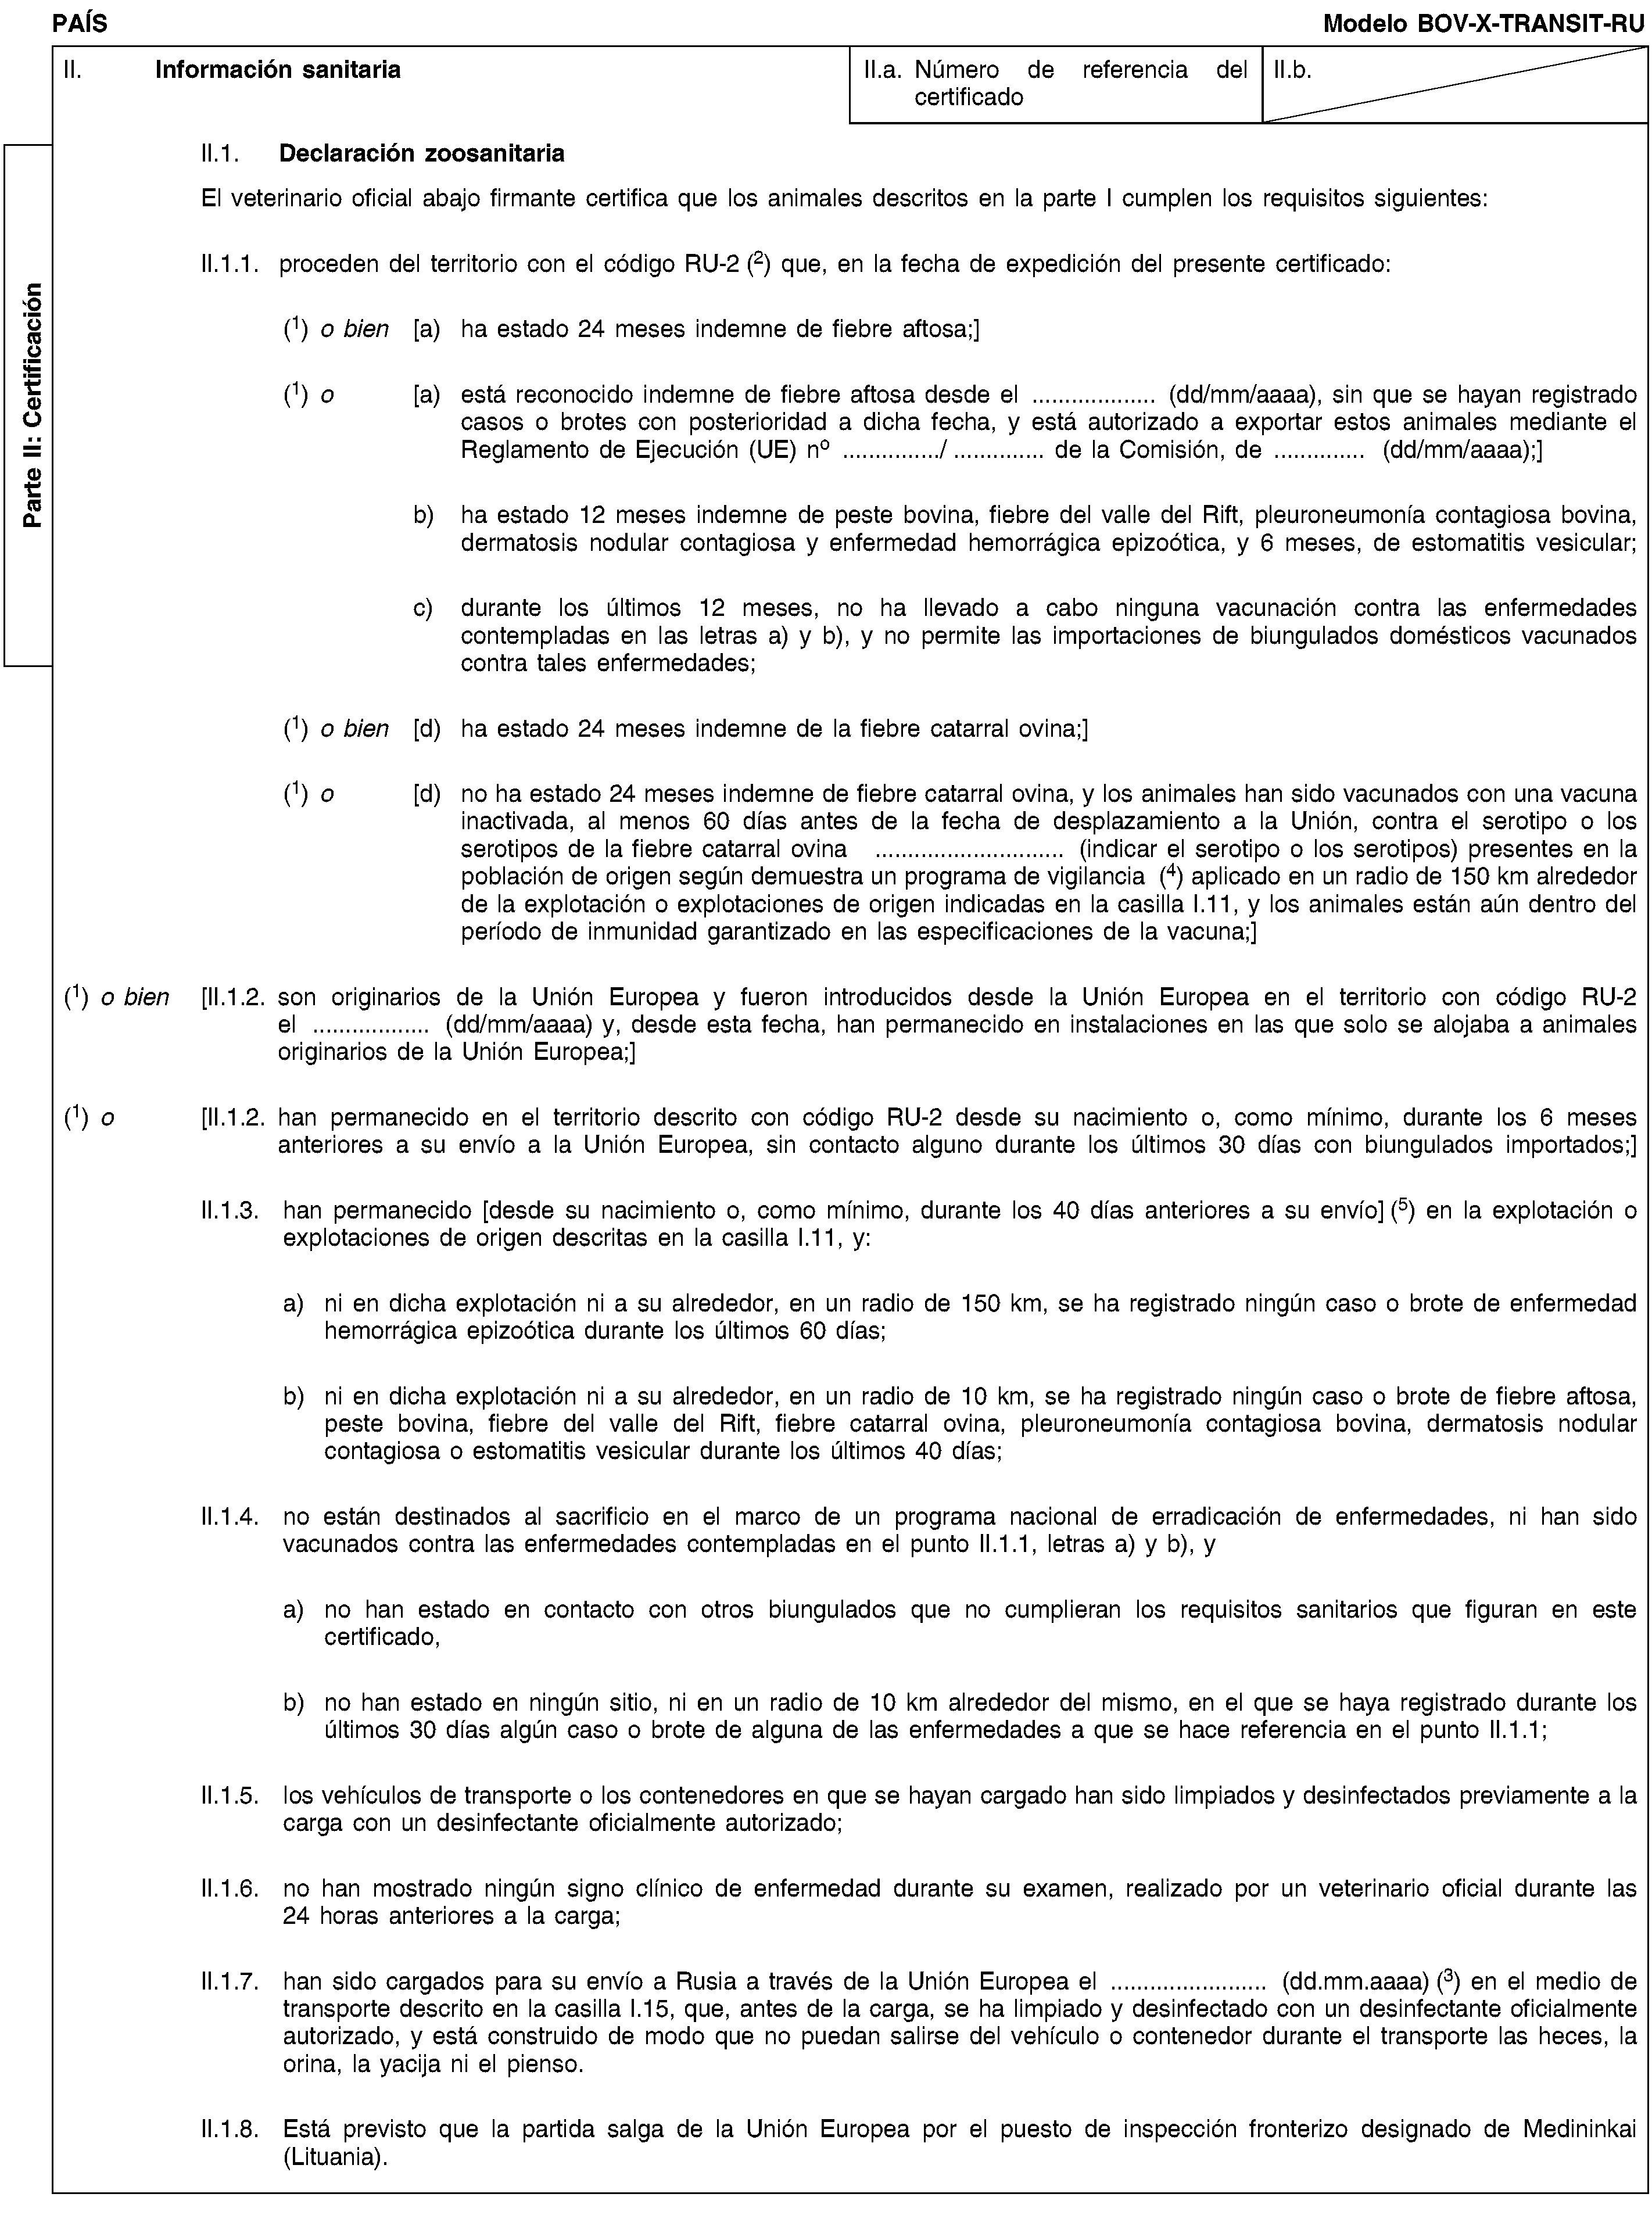 EUR-Lex - 02010R0206-20170701 - EN - EUR-Lex